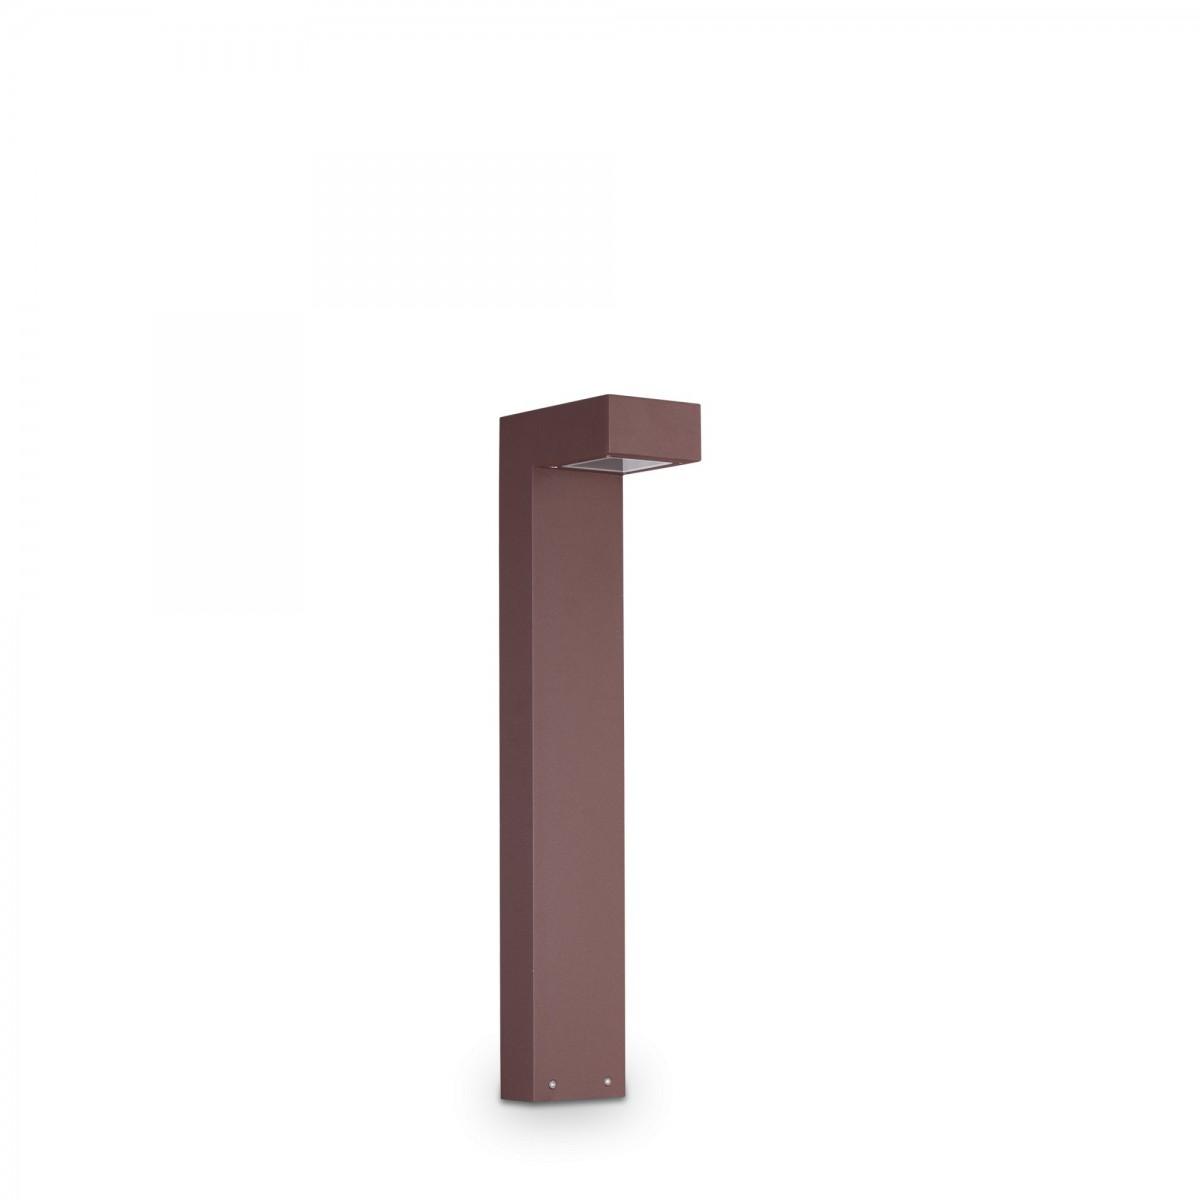 Ideal Lux 213279 venkovní stojací lampa Sirio 2x15W|G9|IP44